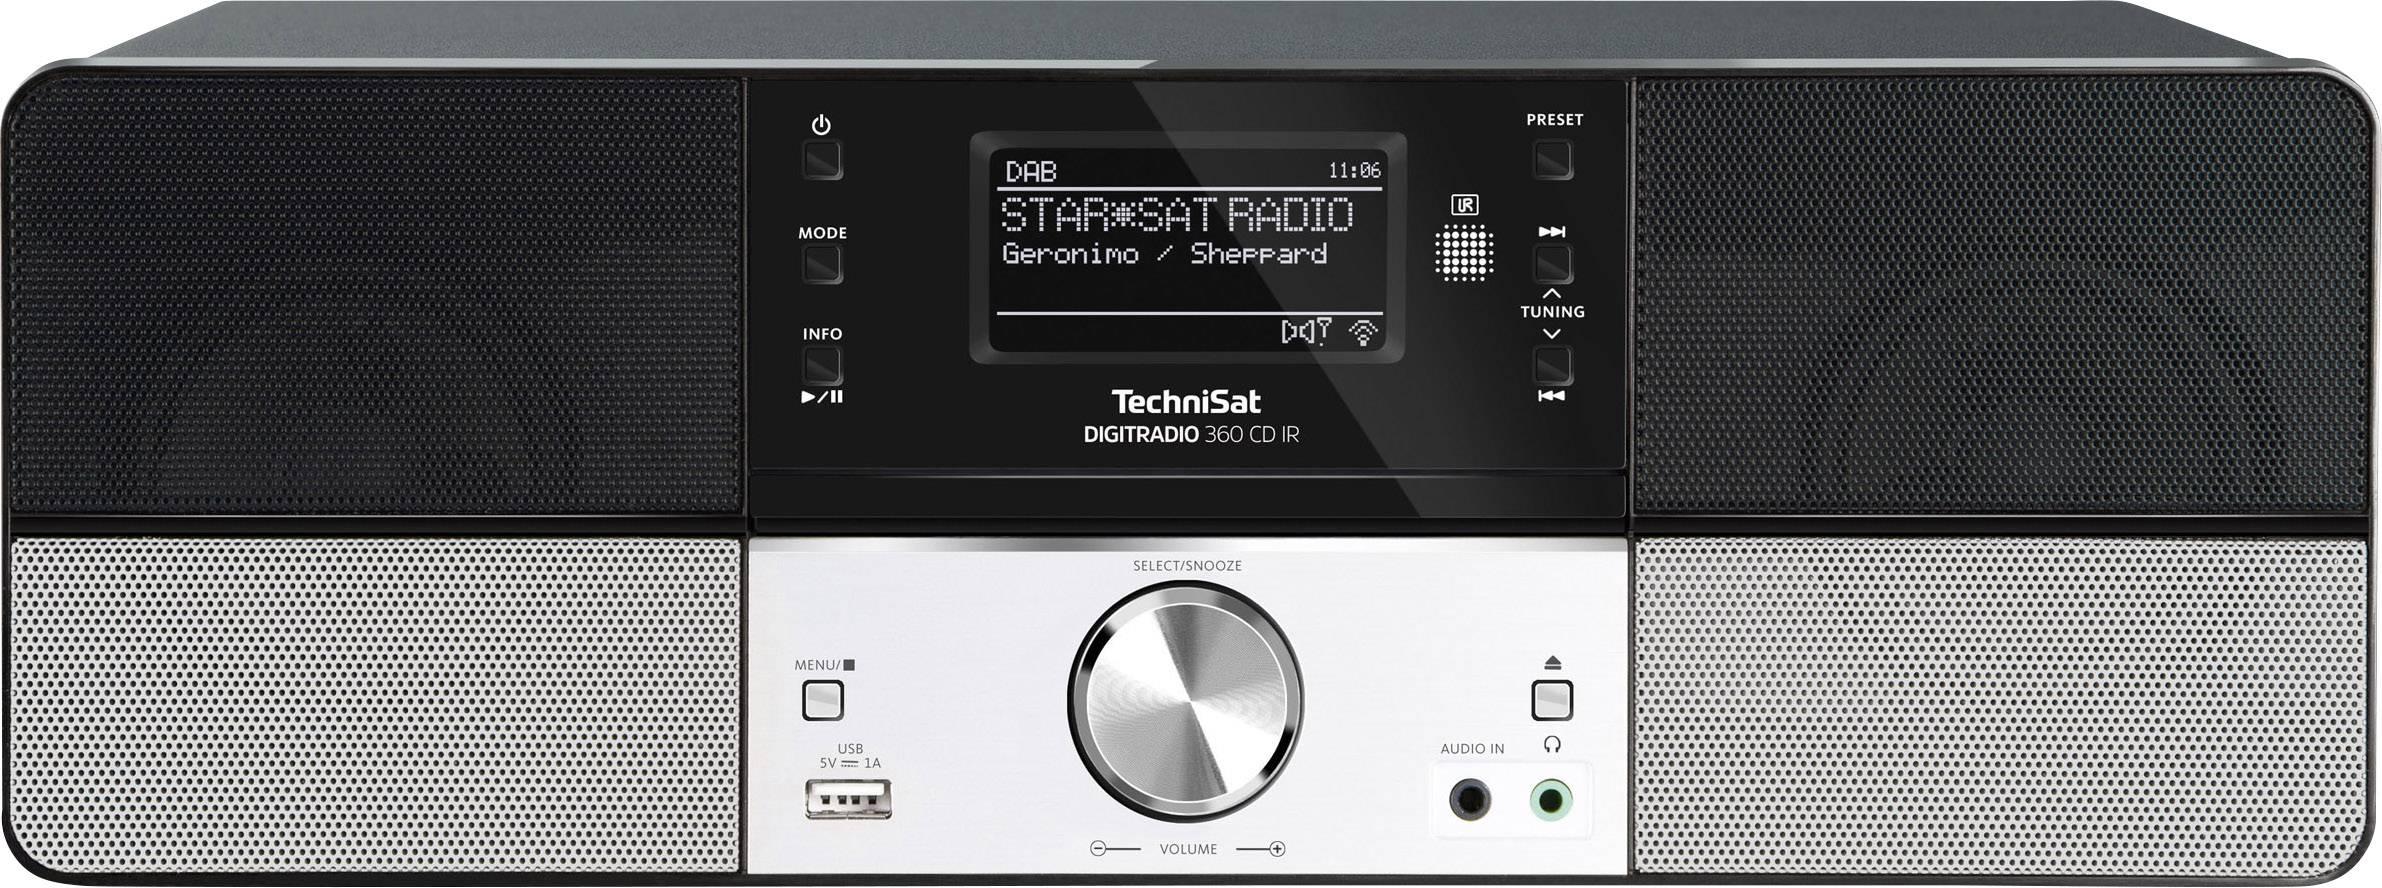 Internetové, DAB+, FM stolné rádio s CD TechniSat DIGITRADIO 360 CD IR, Wi-Fi, čierna